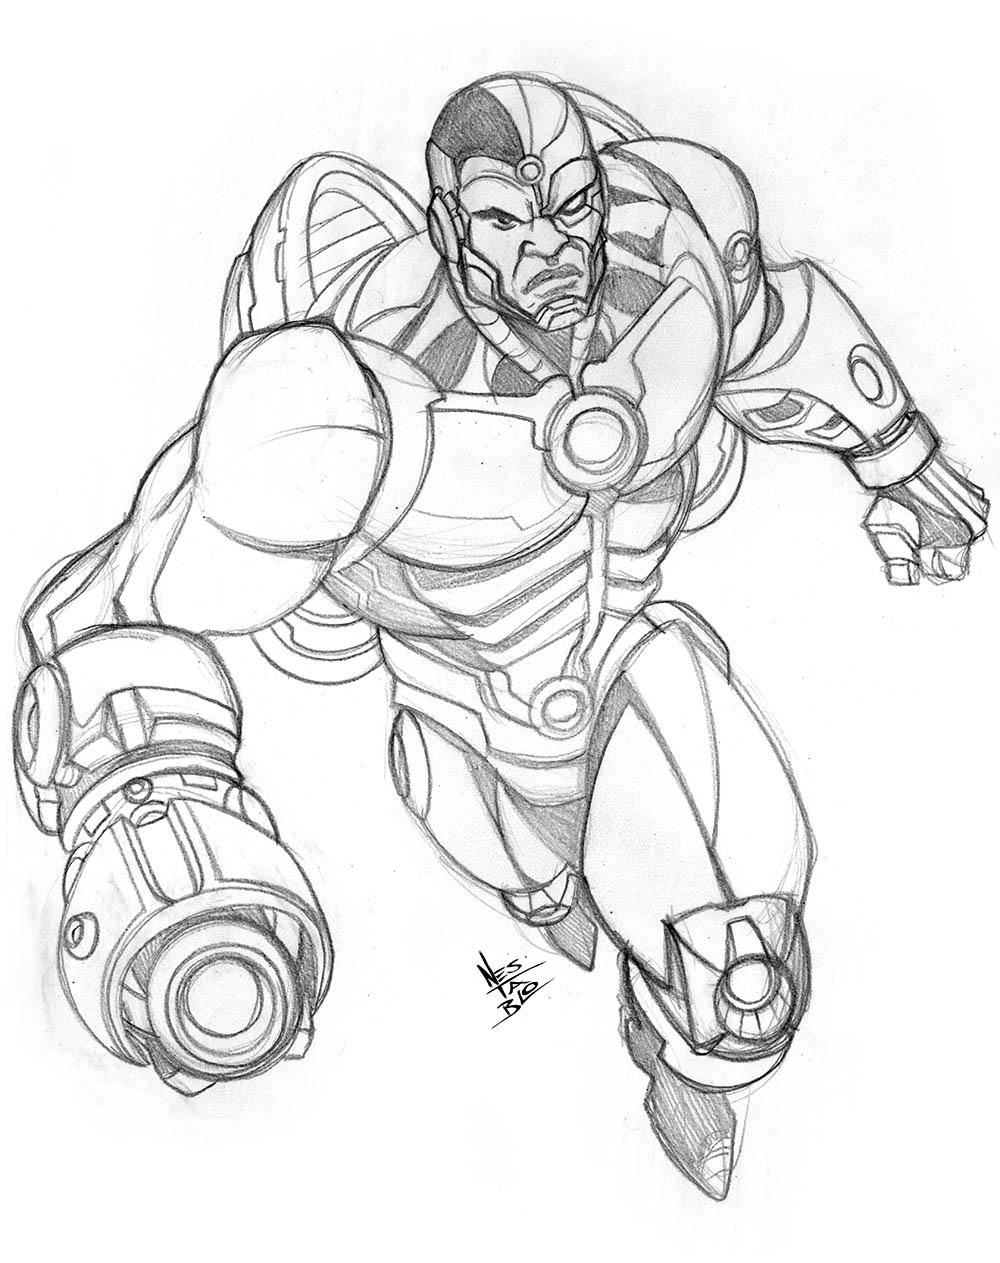 1000x1263 Cyborg Sketch Comic Book Illustration Sketches